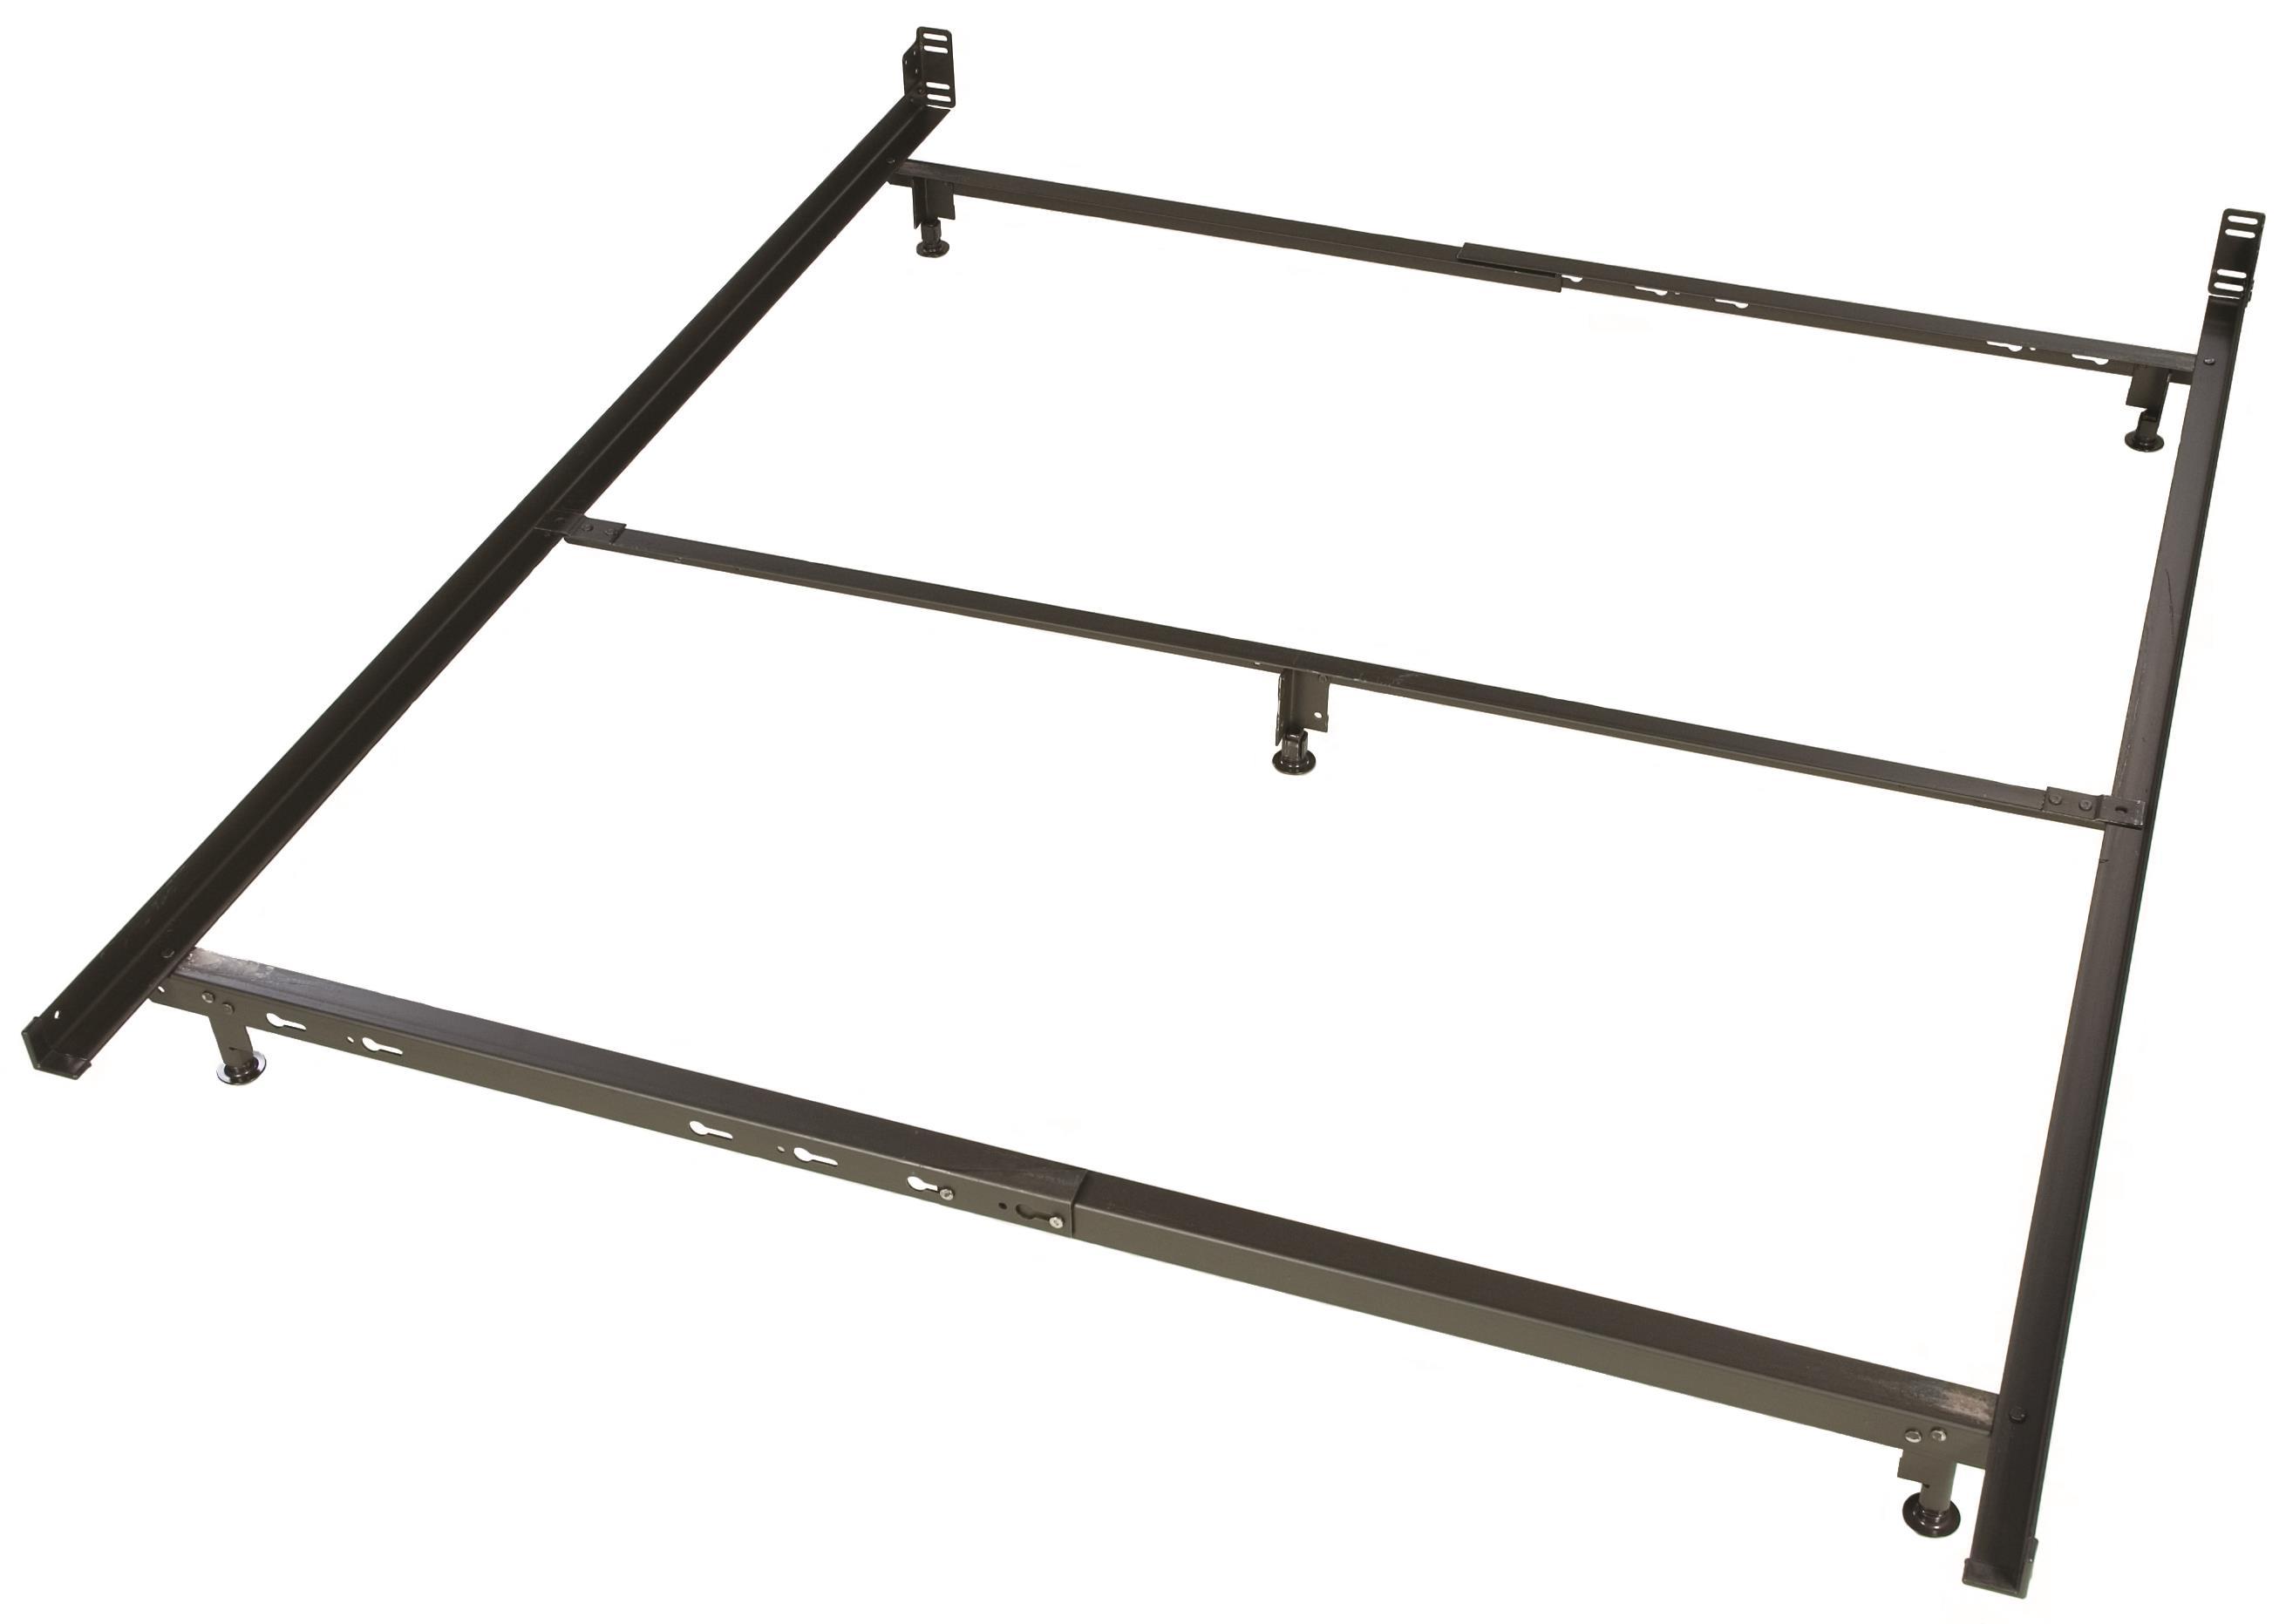 glideaway low profile bed frames lb34 5 leg queen low profile bed frame with glides john v. Black Bedroom Furniture Sets. Home Design Ideas